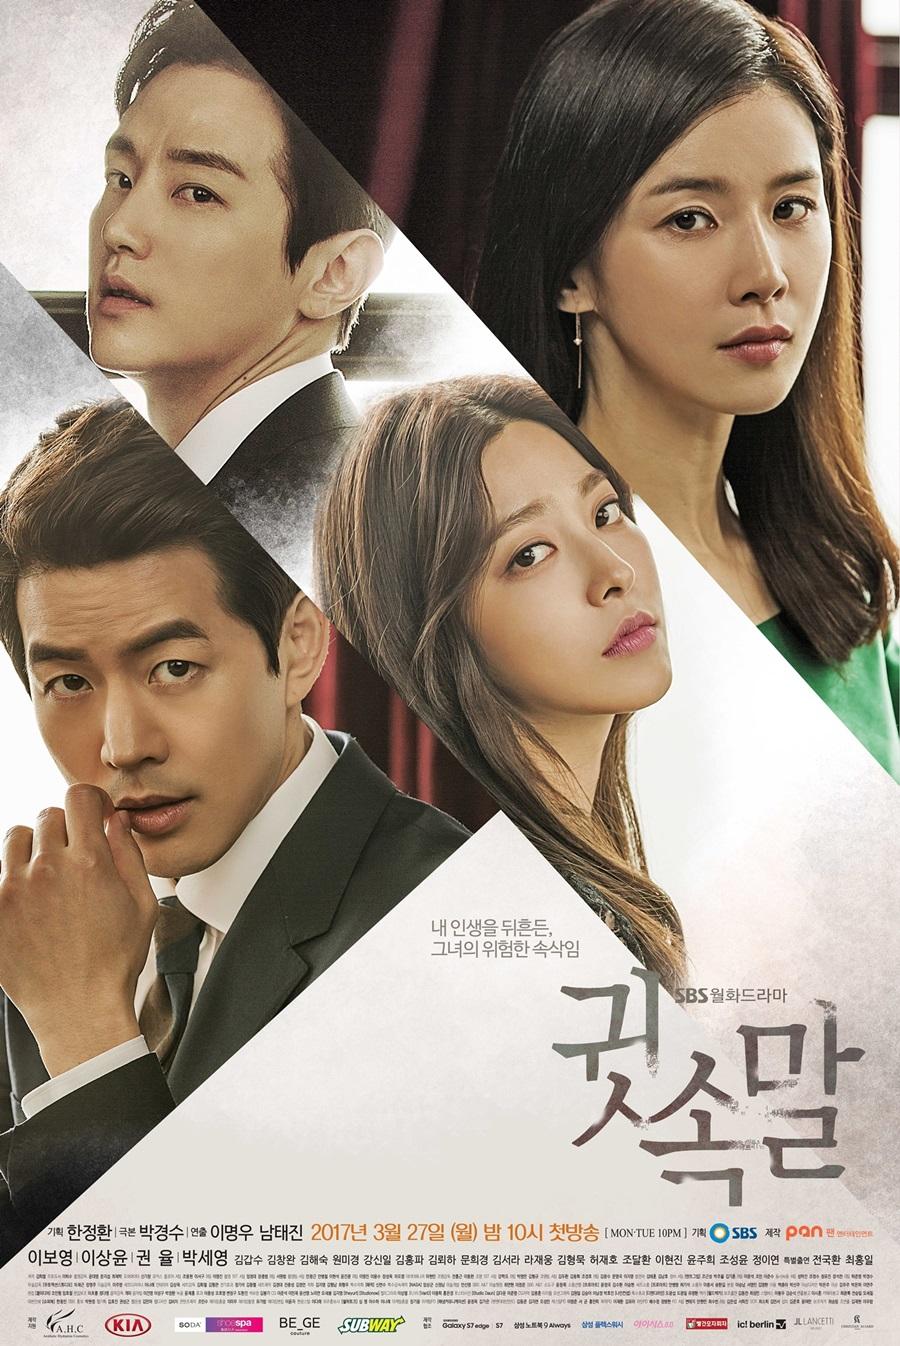 Nonton Drama Korea Whisper sub indo 2017